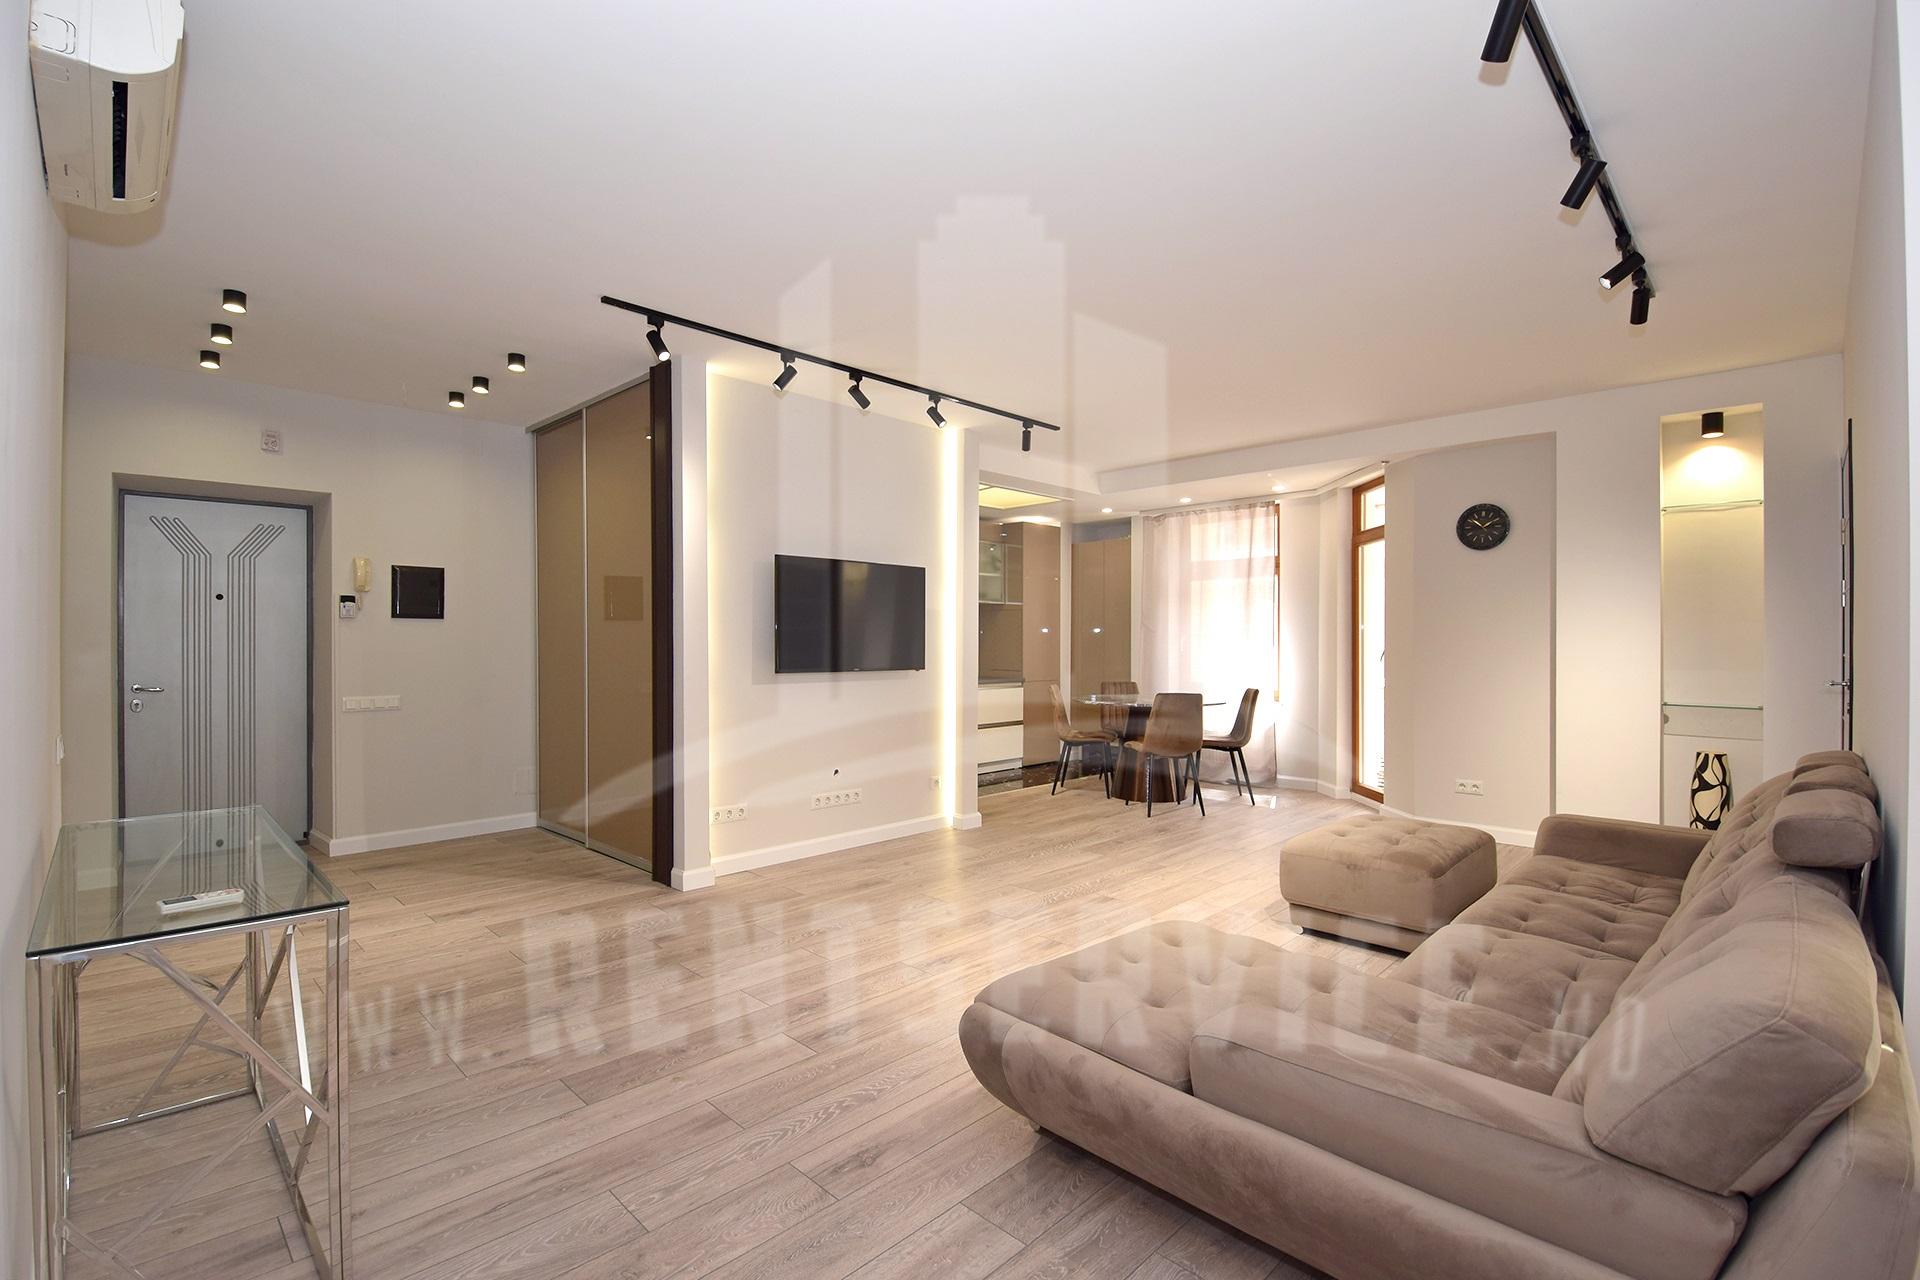 291_apartment_front.JPG